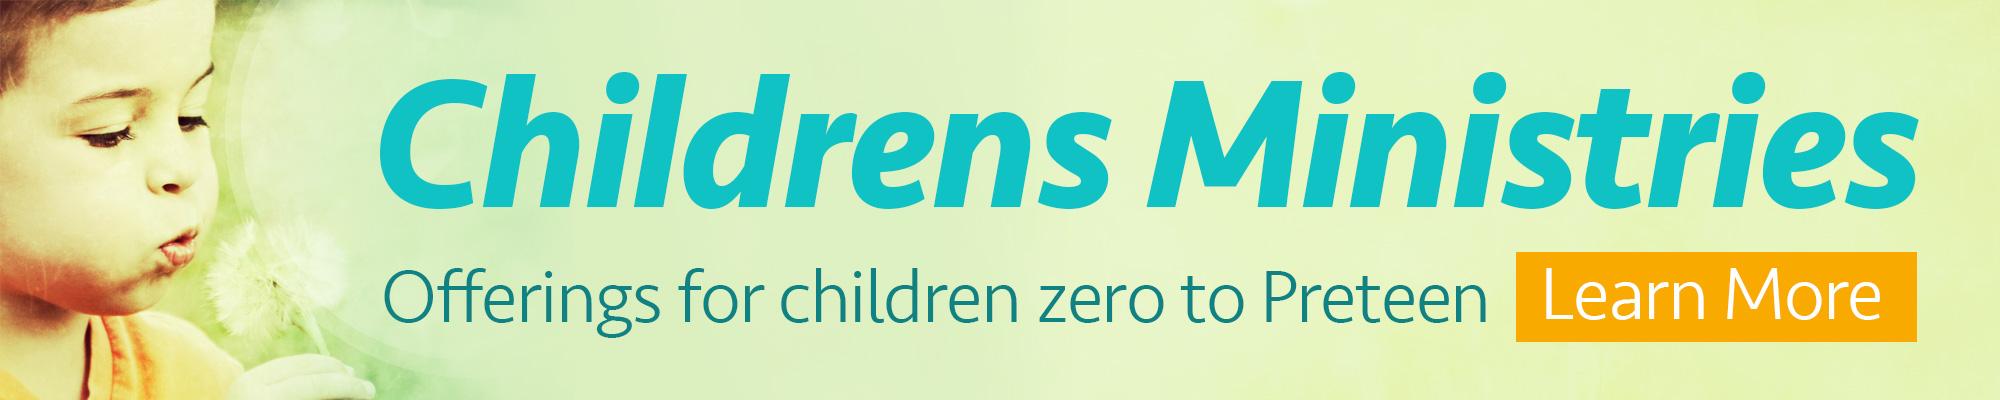 Children-Ministries-Slide-2015